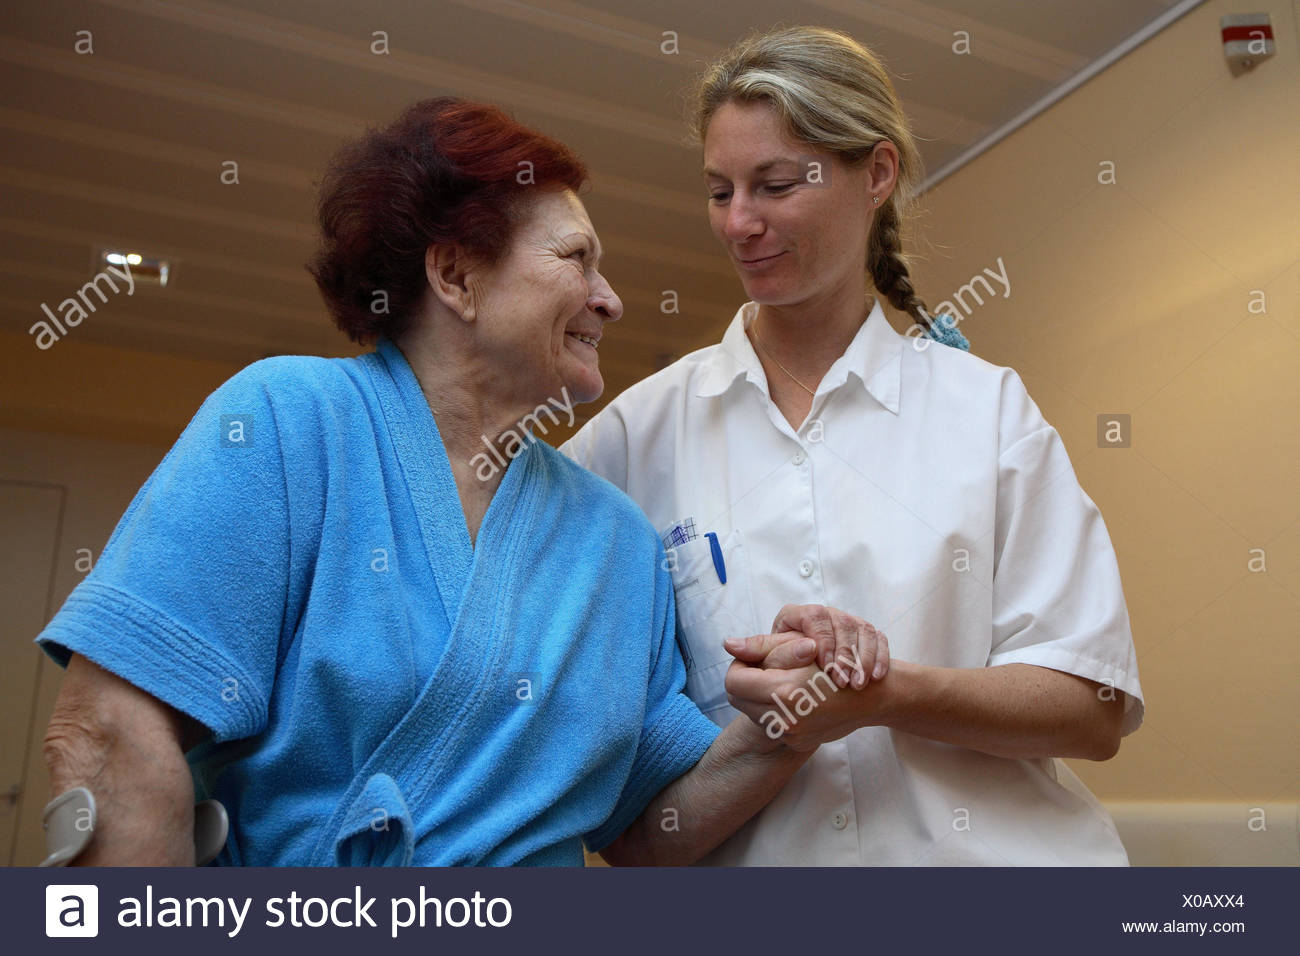 Clinic, physiotherapist, patient, senior, crutch, lead, walking practise, help, eye contact, smile, half portrait, sick person's station, ward, occupation, nursing home, nursing occupations, people, women, two, old, senior citizens, bathrobe, nursing-destitute, in need of care, Reha, nurse, nurse, nursing staff, practice, nursing force, coach, support, support, help, allowance, care, care, convalescense, healing, trust, accompaniment, gratitude, inside, - Stock Image